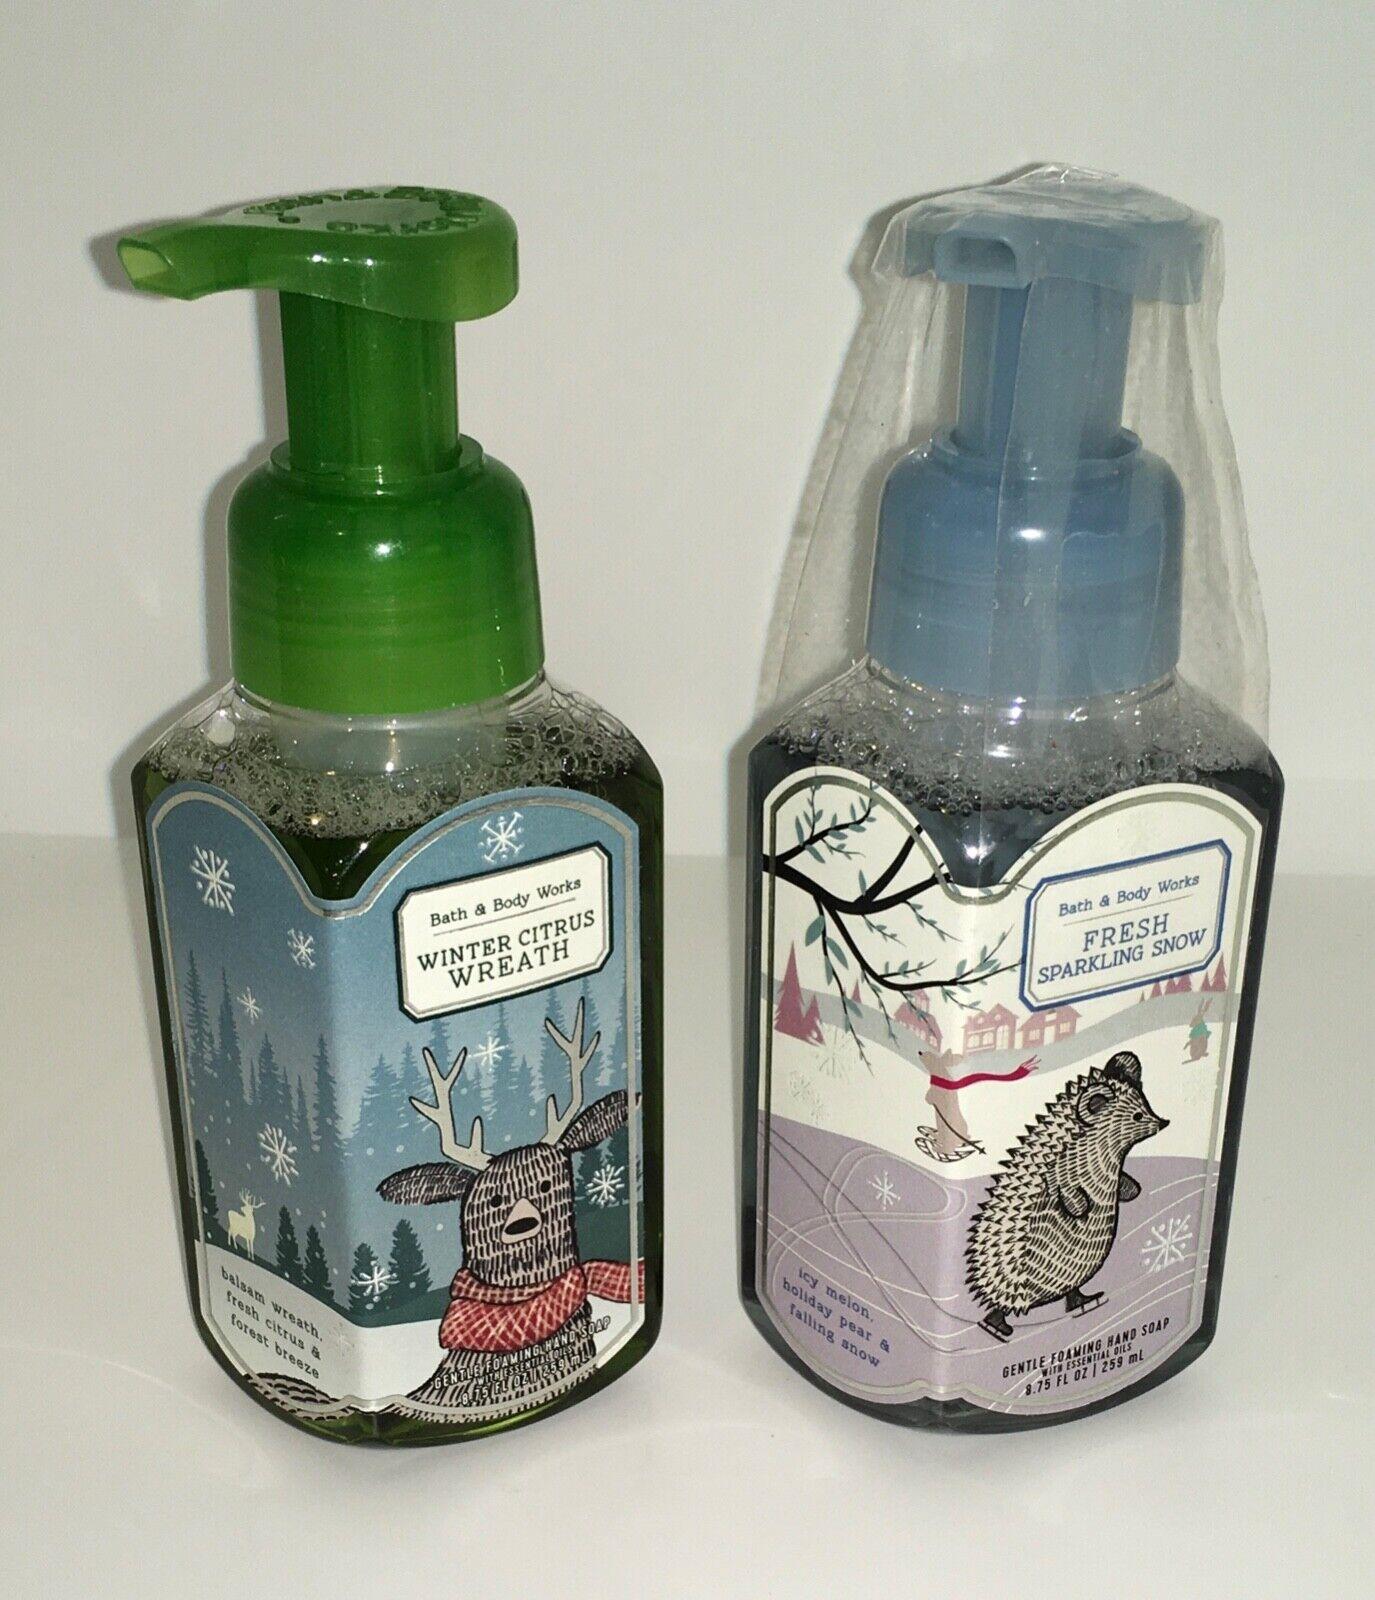 2 Bath Body Works Foaming Soap WINTER CITRUS WREATH FRESH SPARKLING SNOW - $13.88